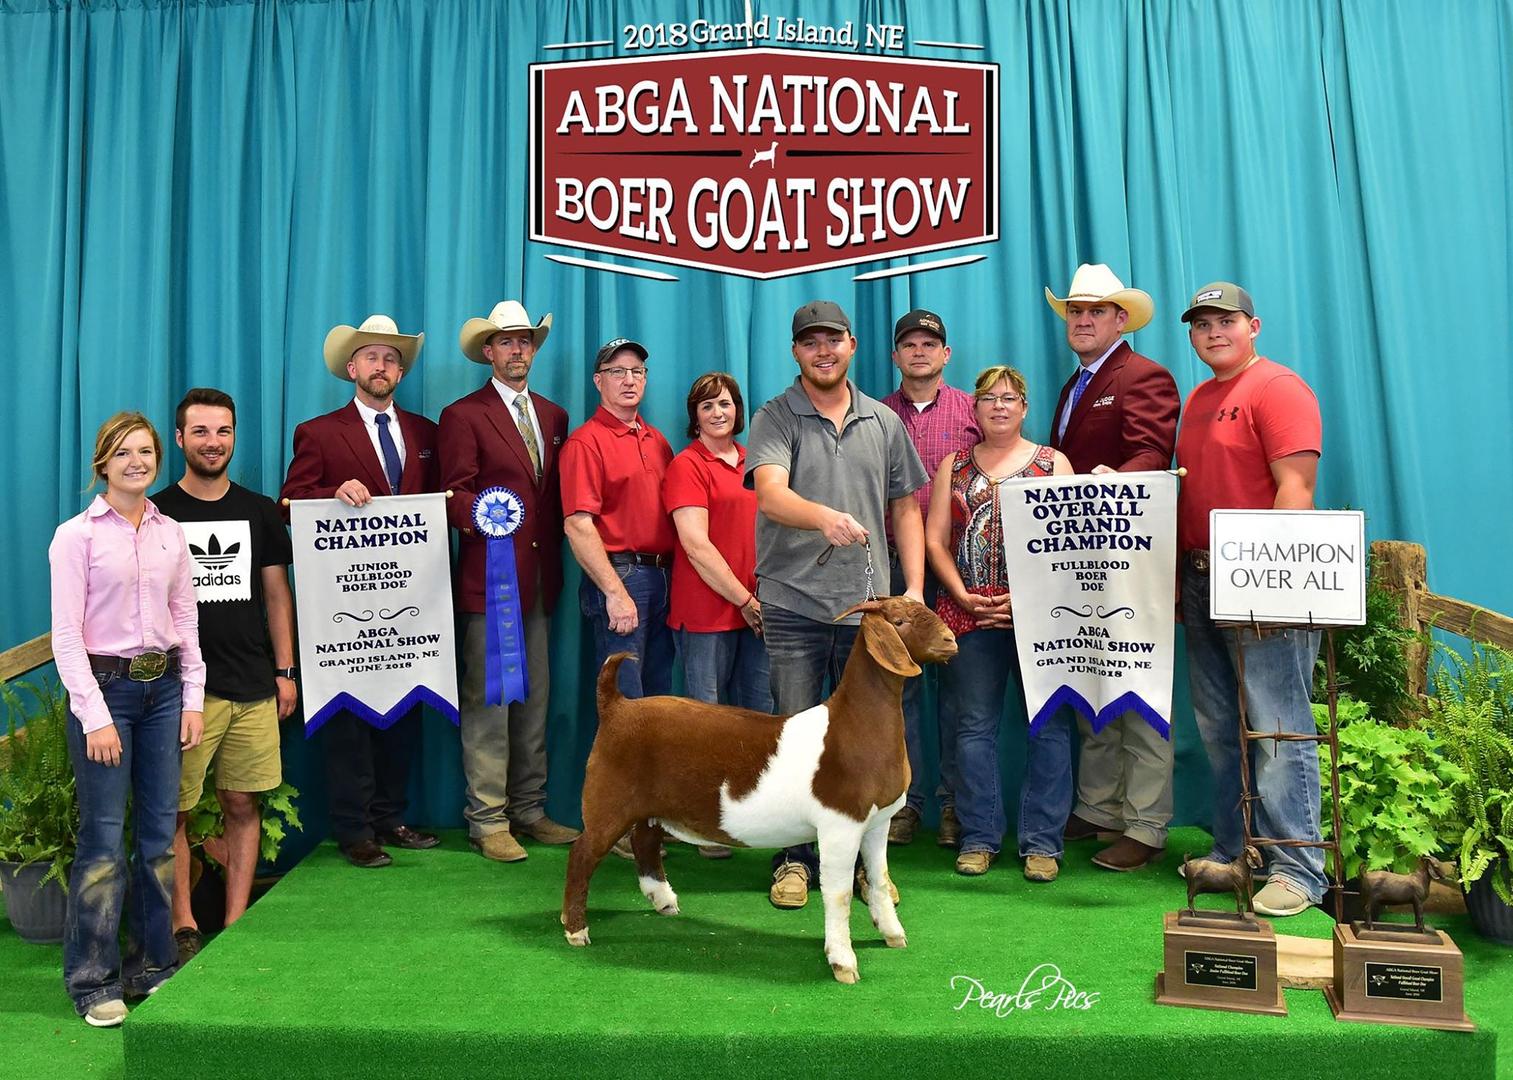 Teel Show Goats - Show Goats for Sale, Boer Goat Breeders, Boer Goat